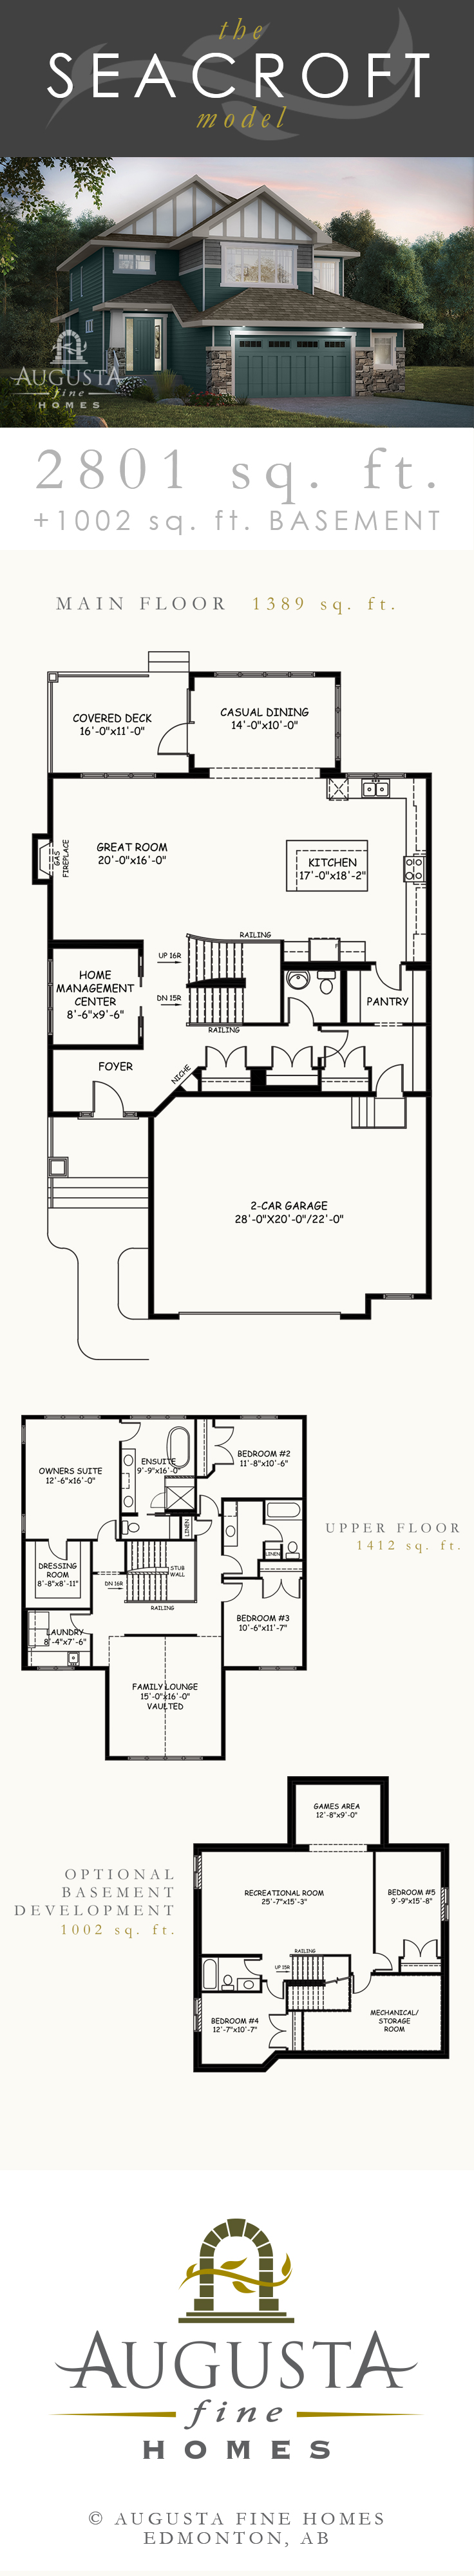 The Seacroft New Home Model By Augusta Fine Homes In Edmonton Alberta Canada Estate Home Layout Custom Floor Plans House Floor Plans Custom Home Builders